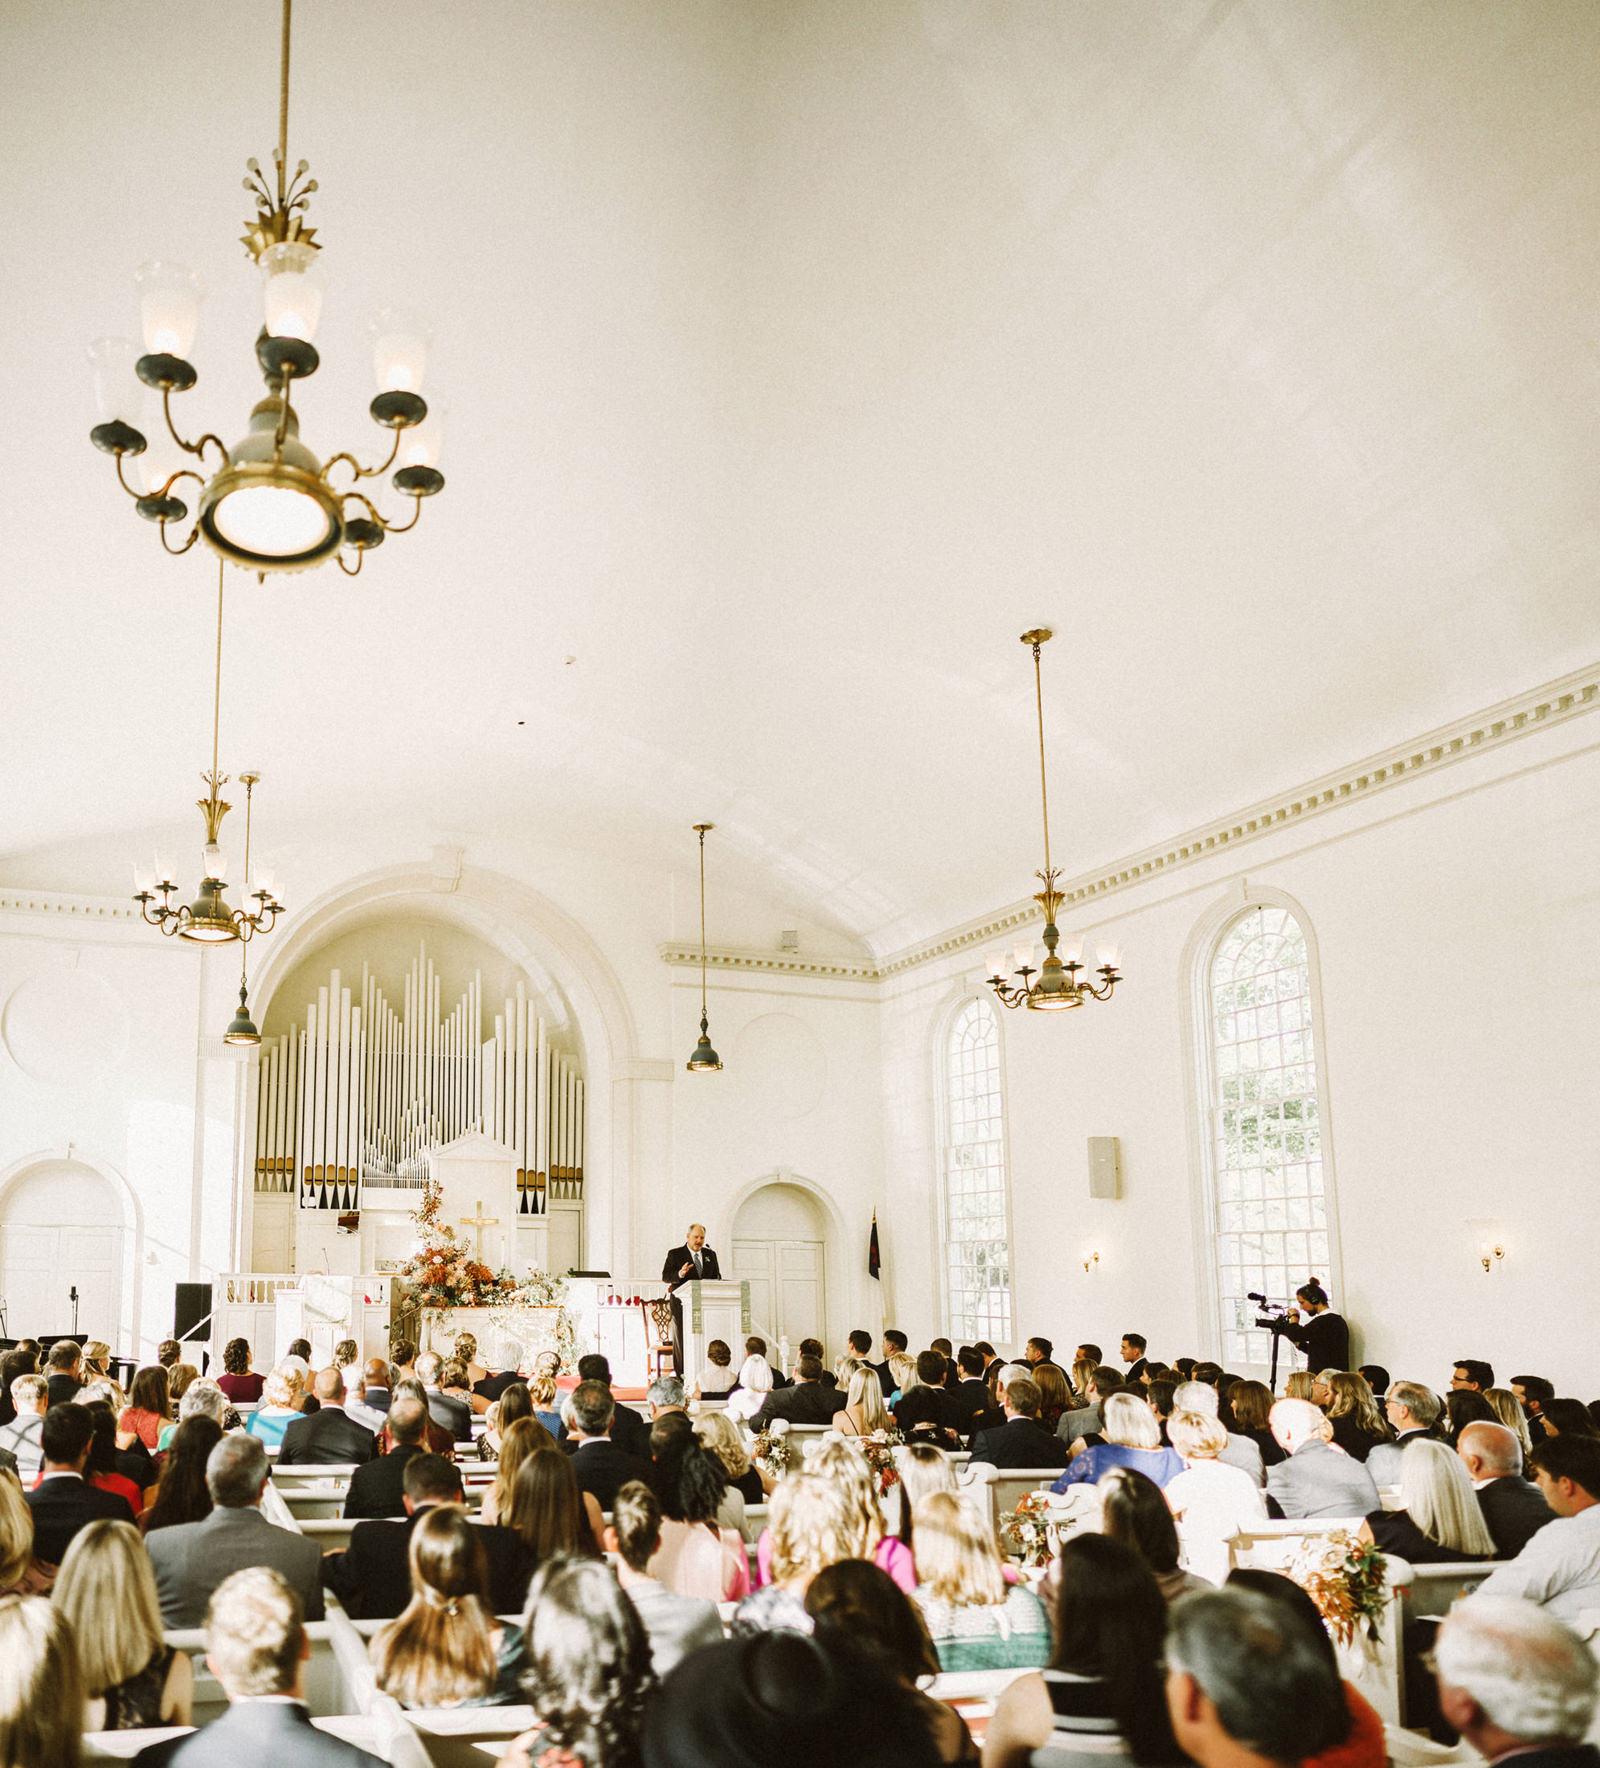 bridgeport-wedding-068 BRIDGEPORT, CONNECTICUT BACKYARD WEDDING